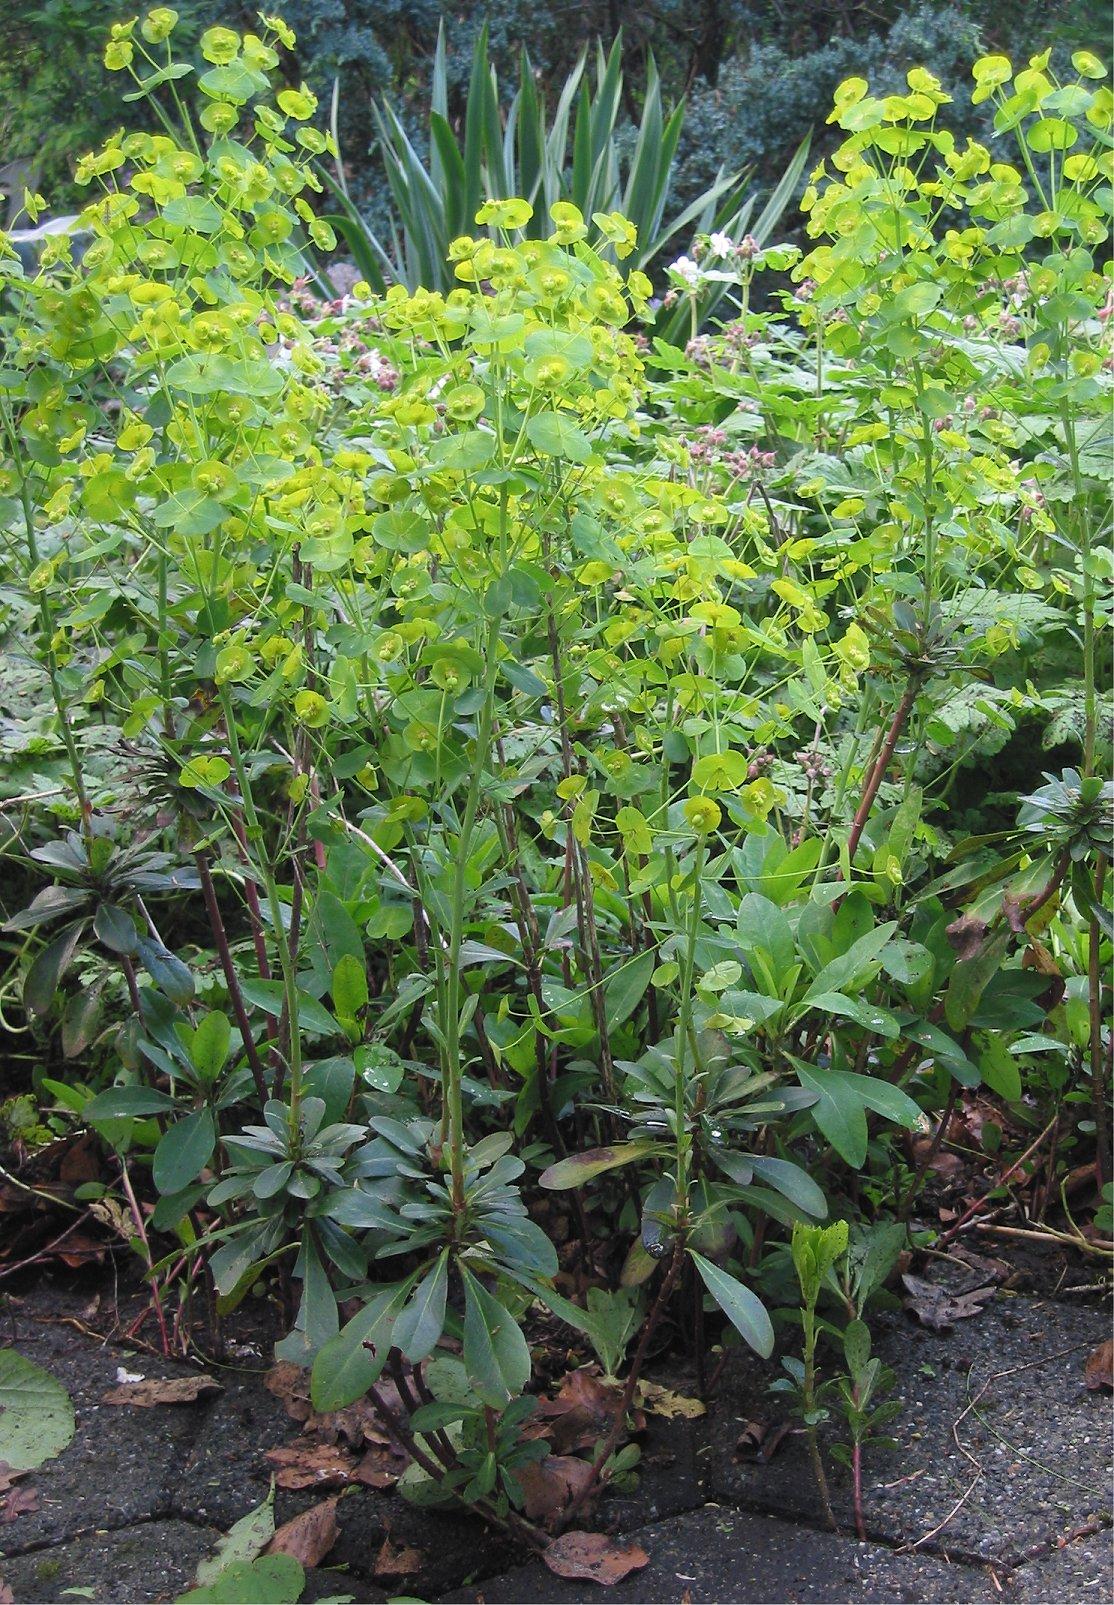 http://upload.wikimedia.org/wikipedia/commons/d/d5/Amandelwolfsmelk_Euphorbia_amygdaloides_plant.jpg